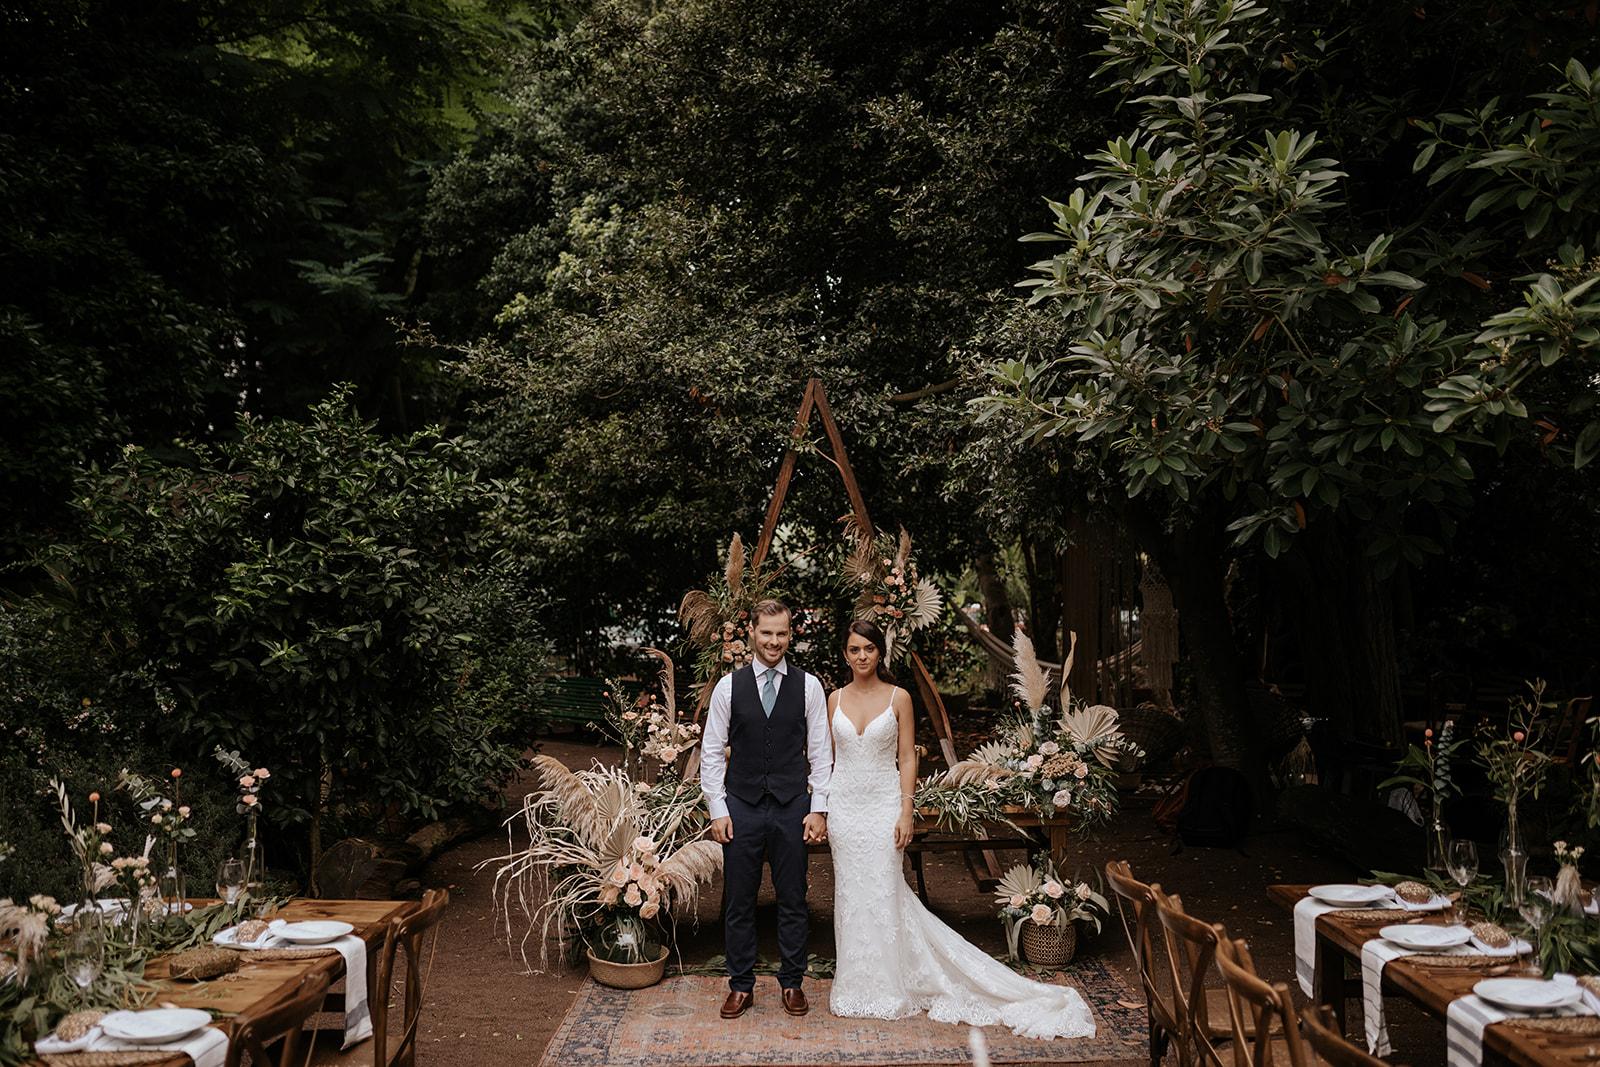 Wedding In Tenerife - Wedding Planners Canary Islands